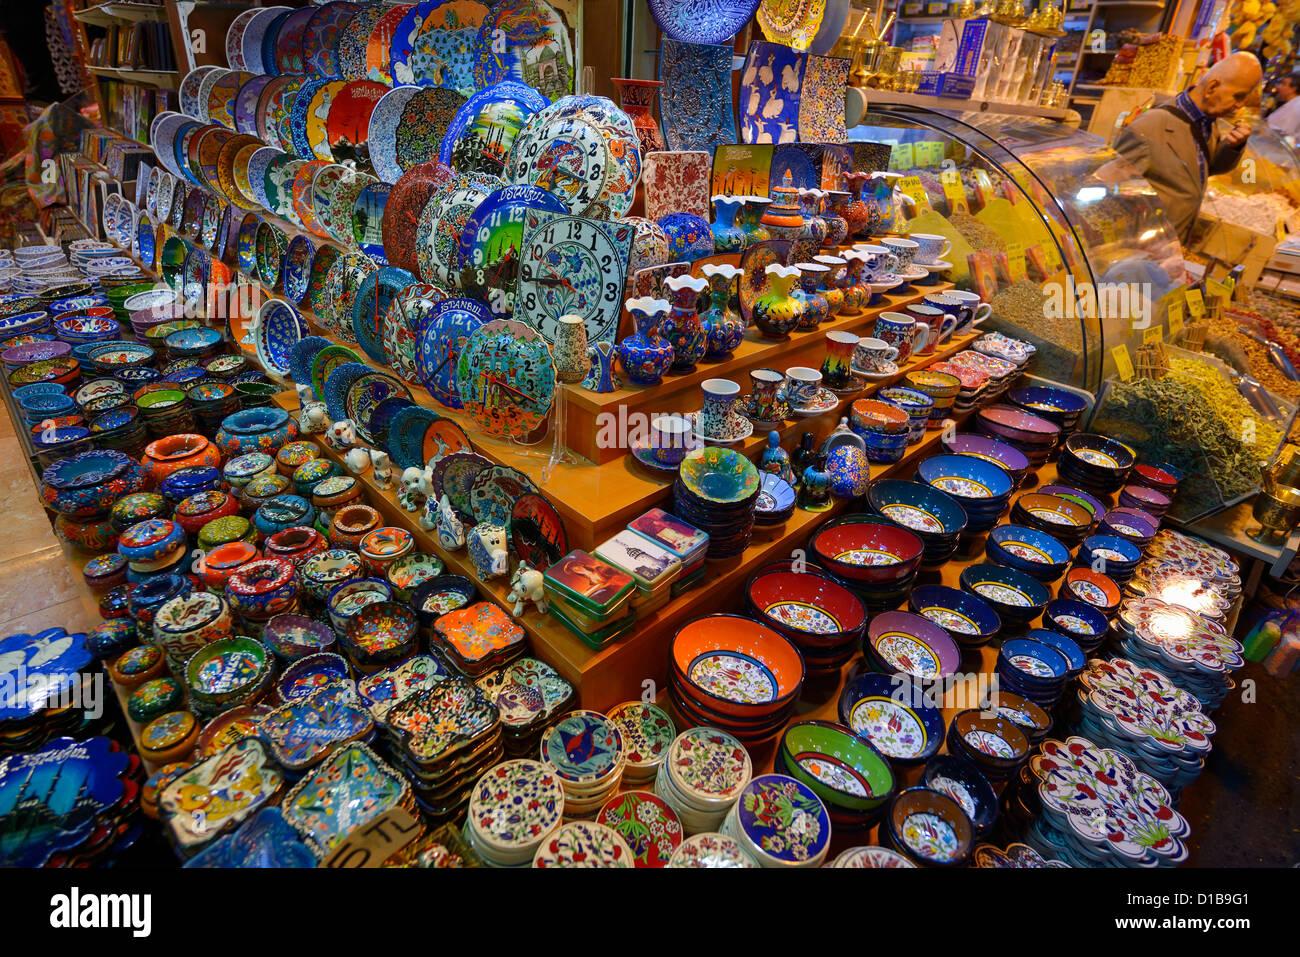 Ceramic display in the Egyptian Bazaar Istanbul next to a spice shop Eminonu Fatih Turkey - Stock Image